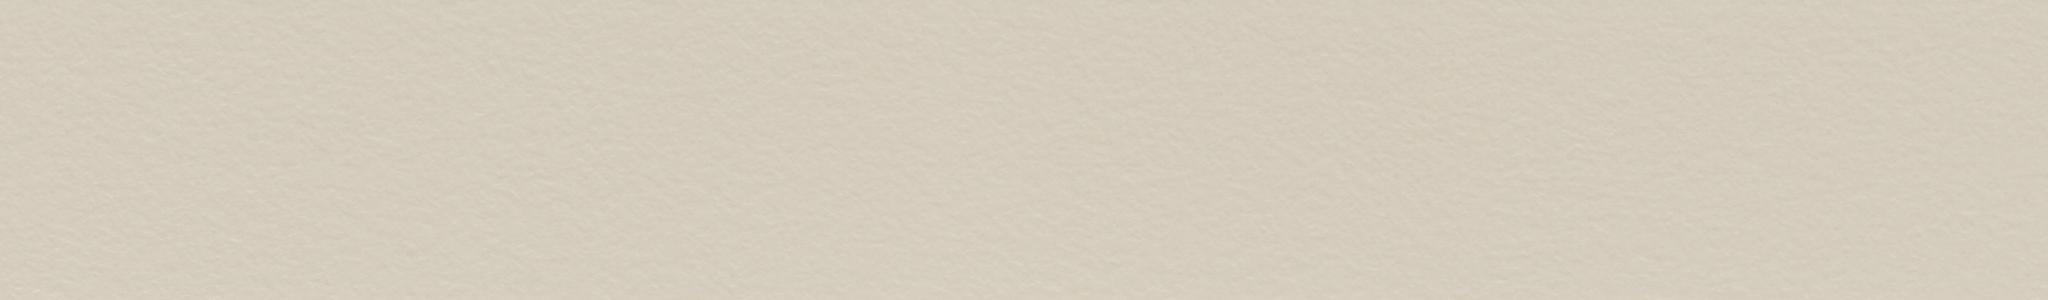 HU 188533 ABS Edge Cappuccino Soft Pearl 107